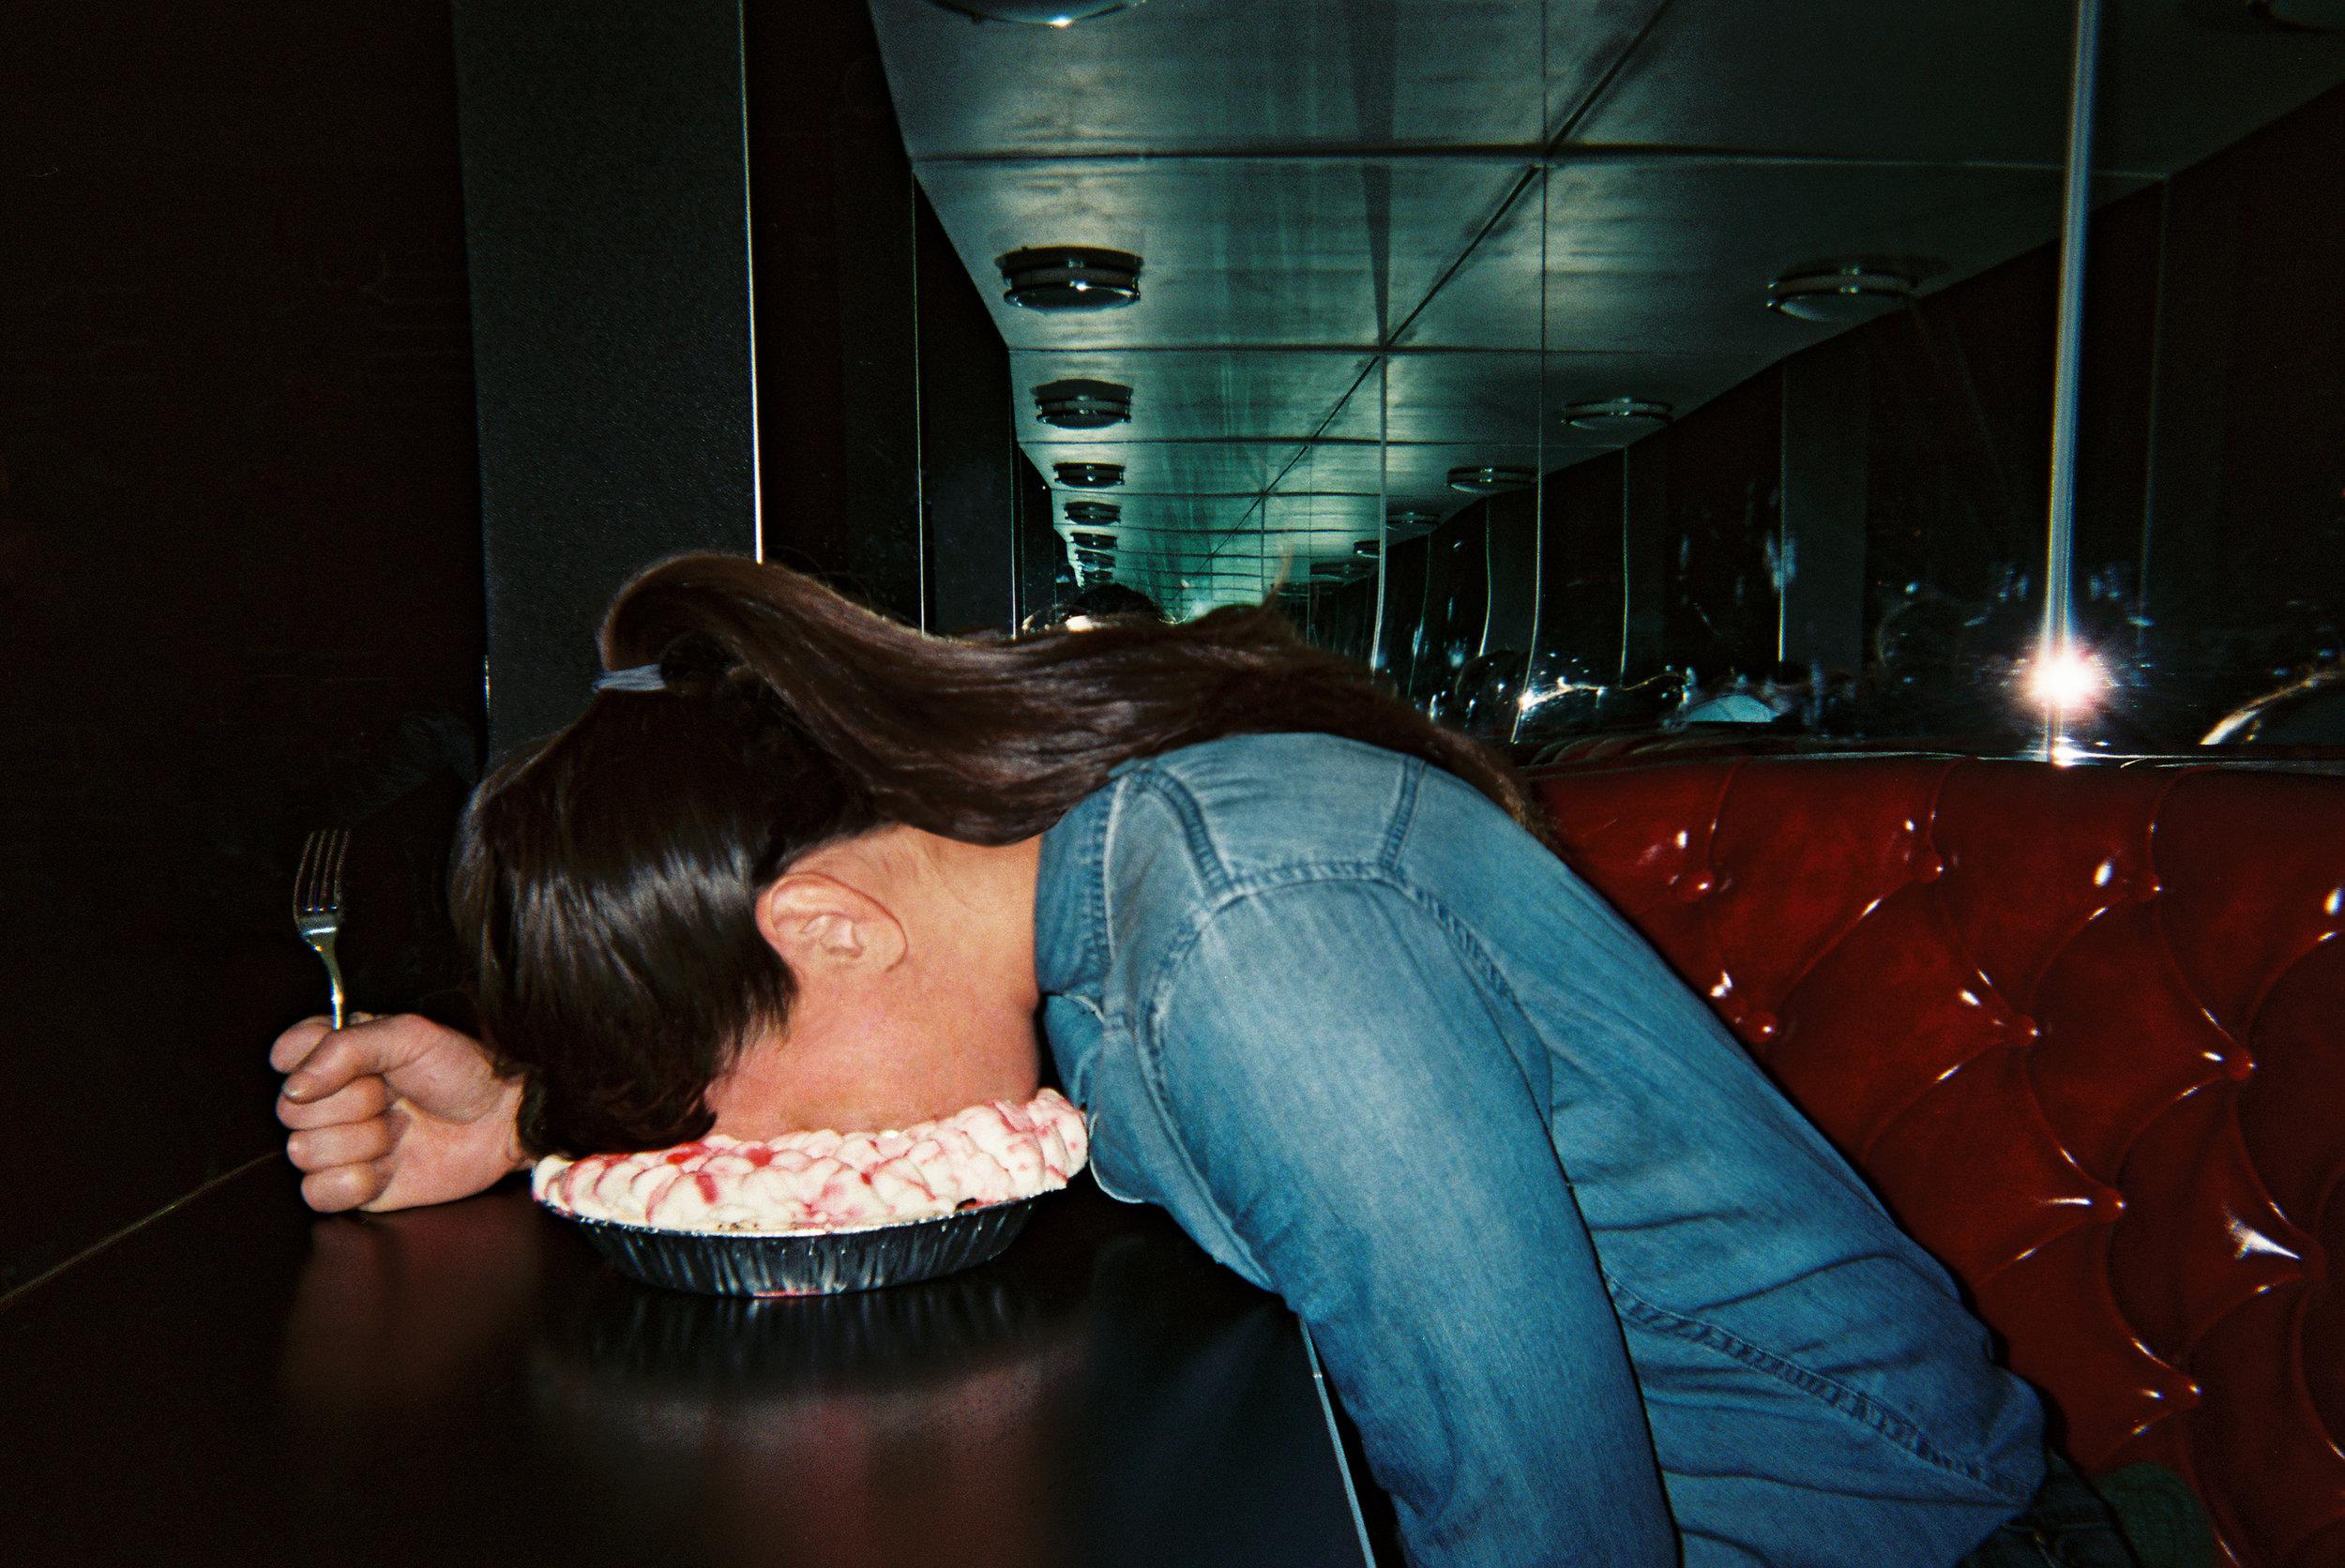 *Photo cred: Max Esposito **Pie cred: Rosebud Diner